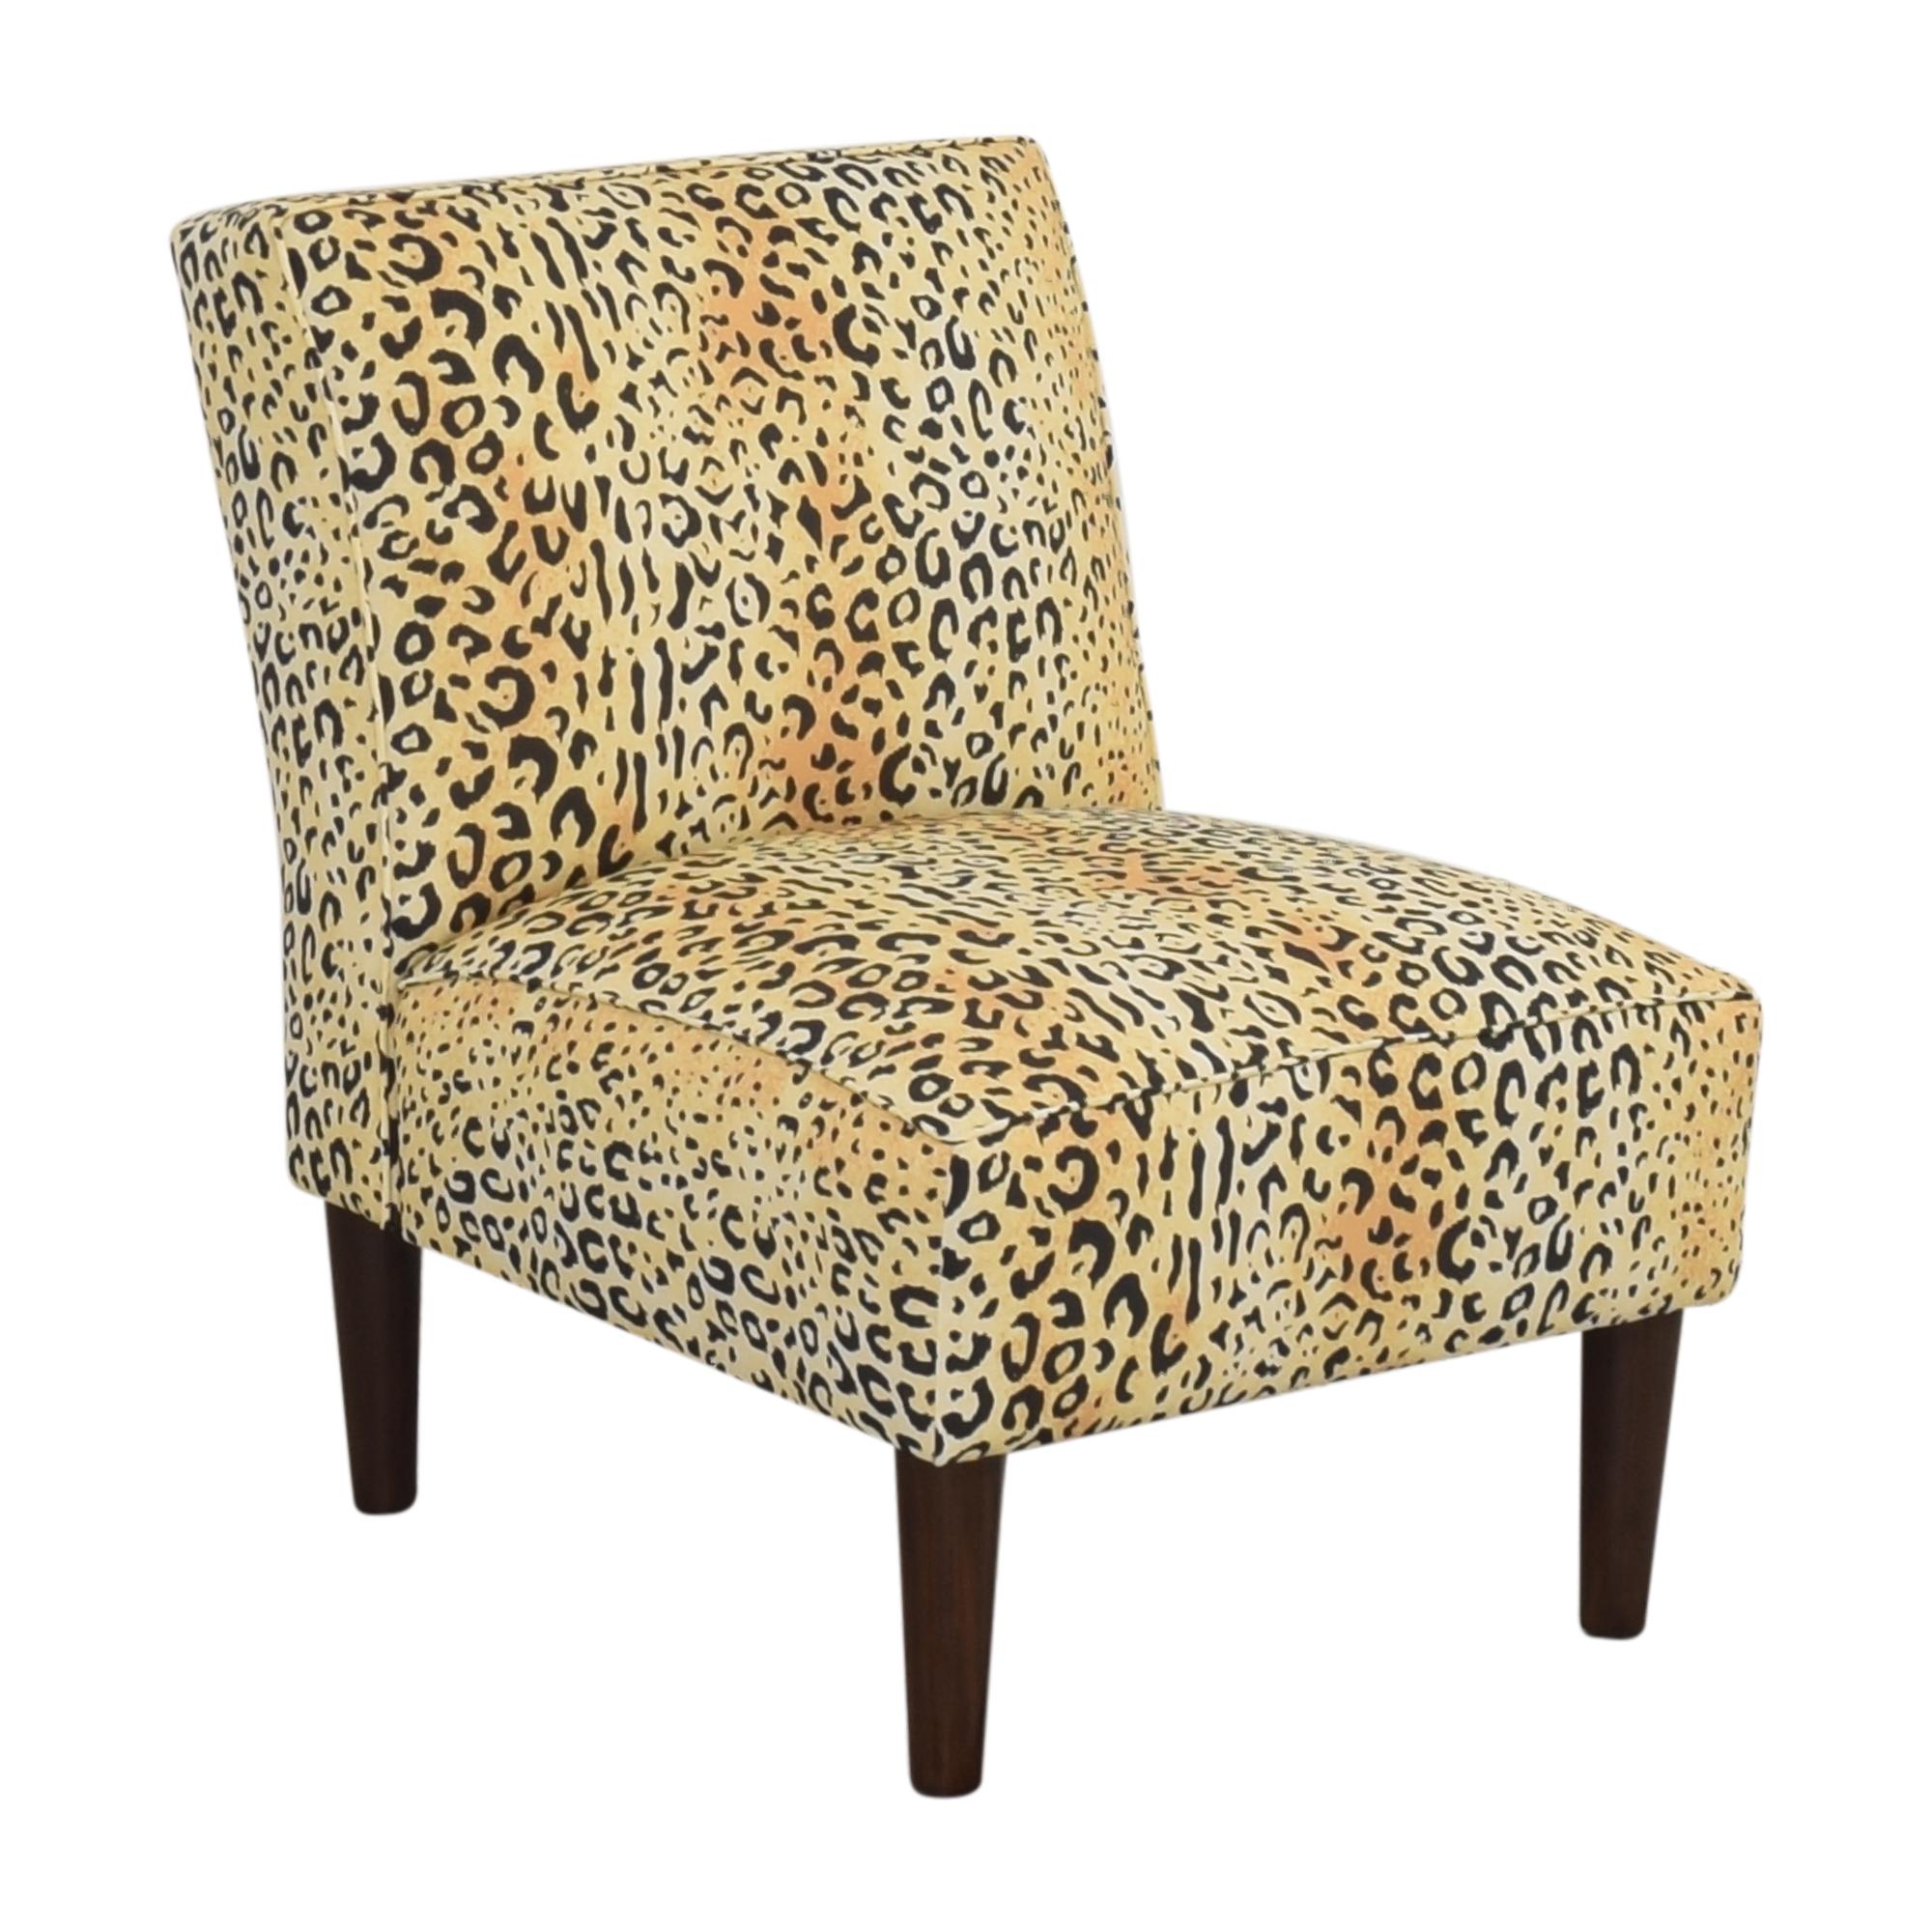 The Inside The Inside Slipper Chair pa